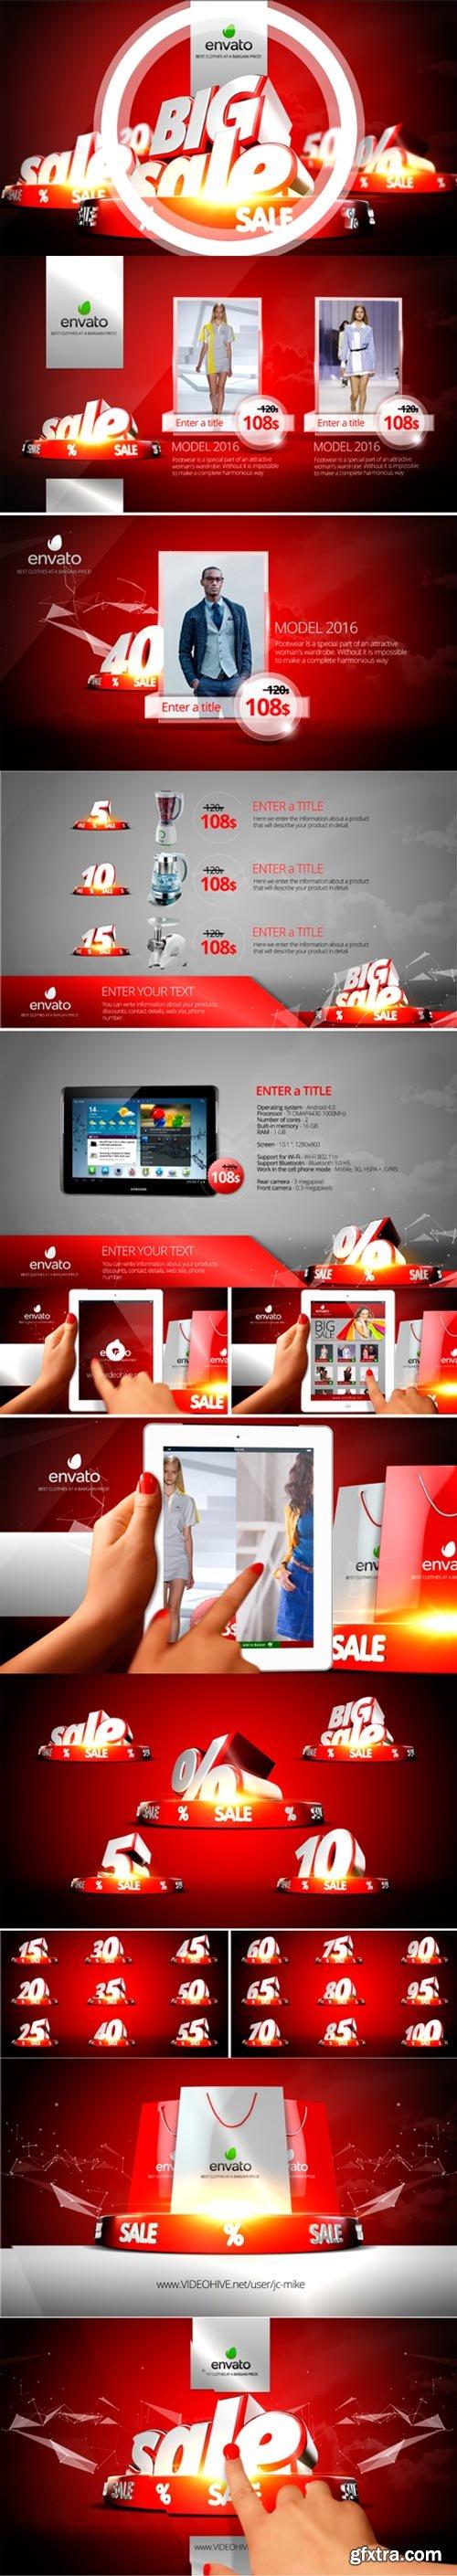 Videohive - Big Sale - 16976147